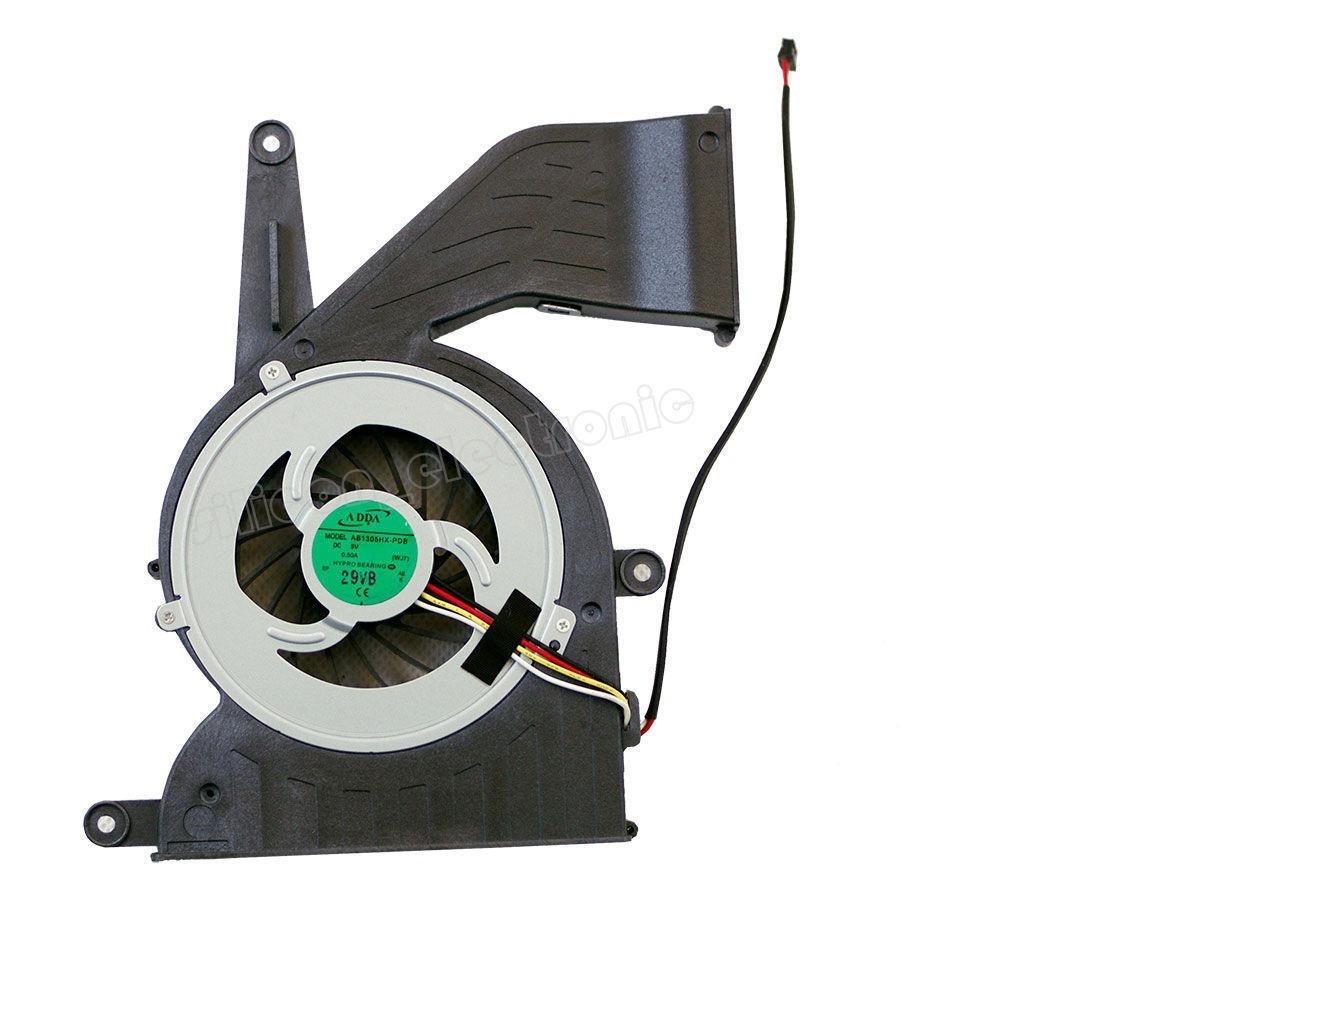 New CPU cooling fan For HP OMNI AIO 120-1132 120 12 658909-001 AB1305HX-PDB Fan